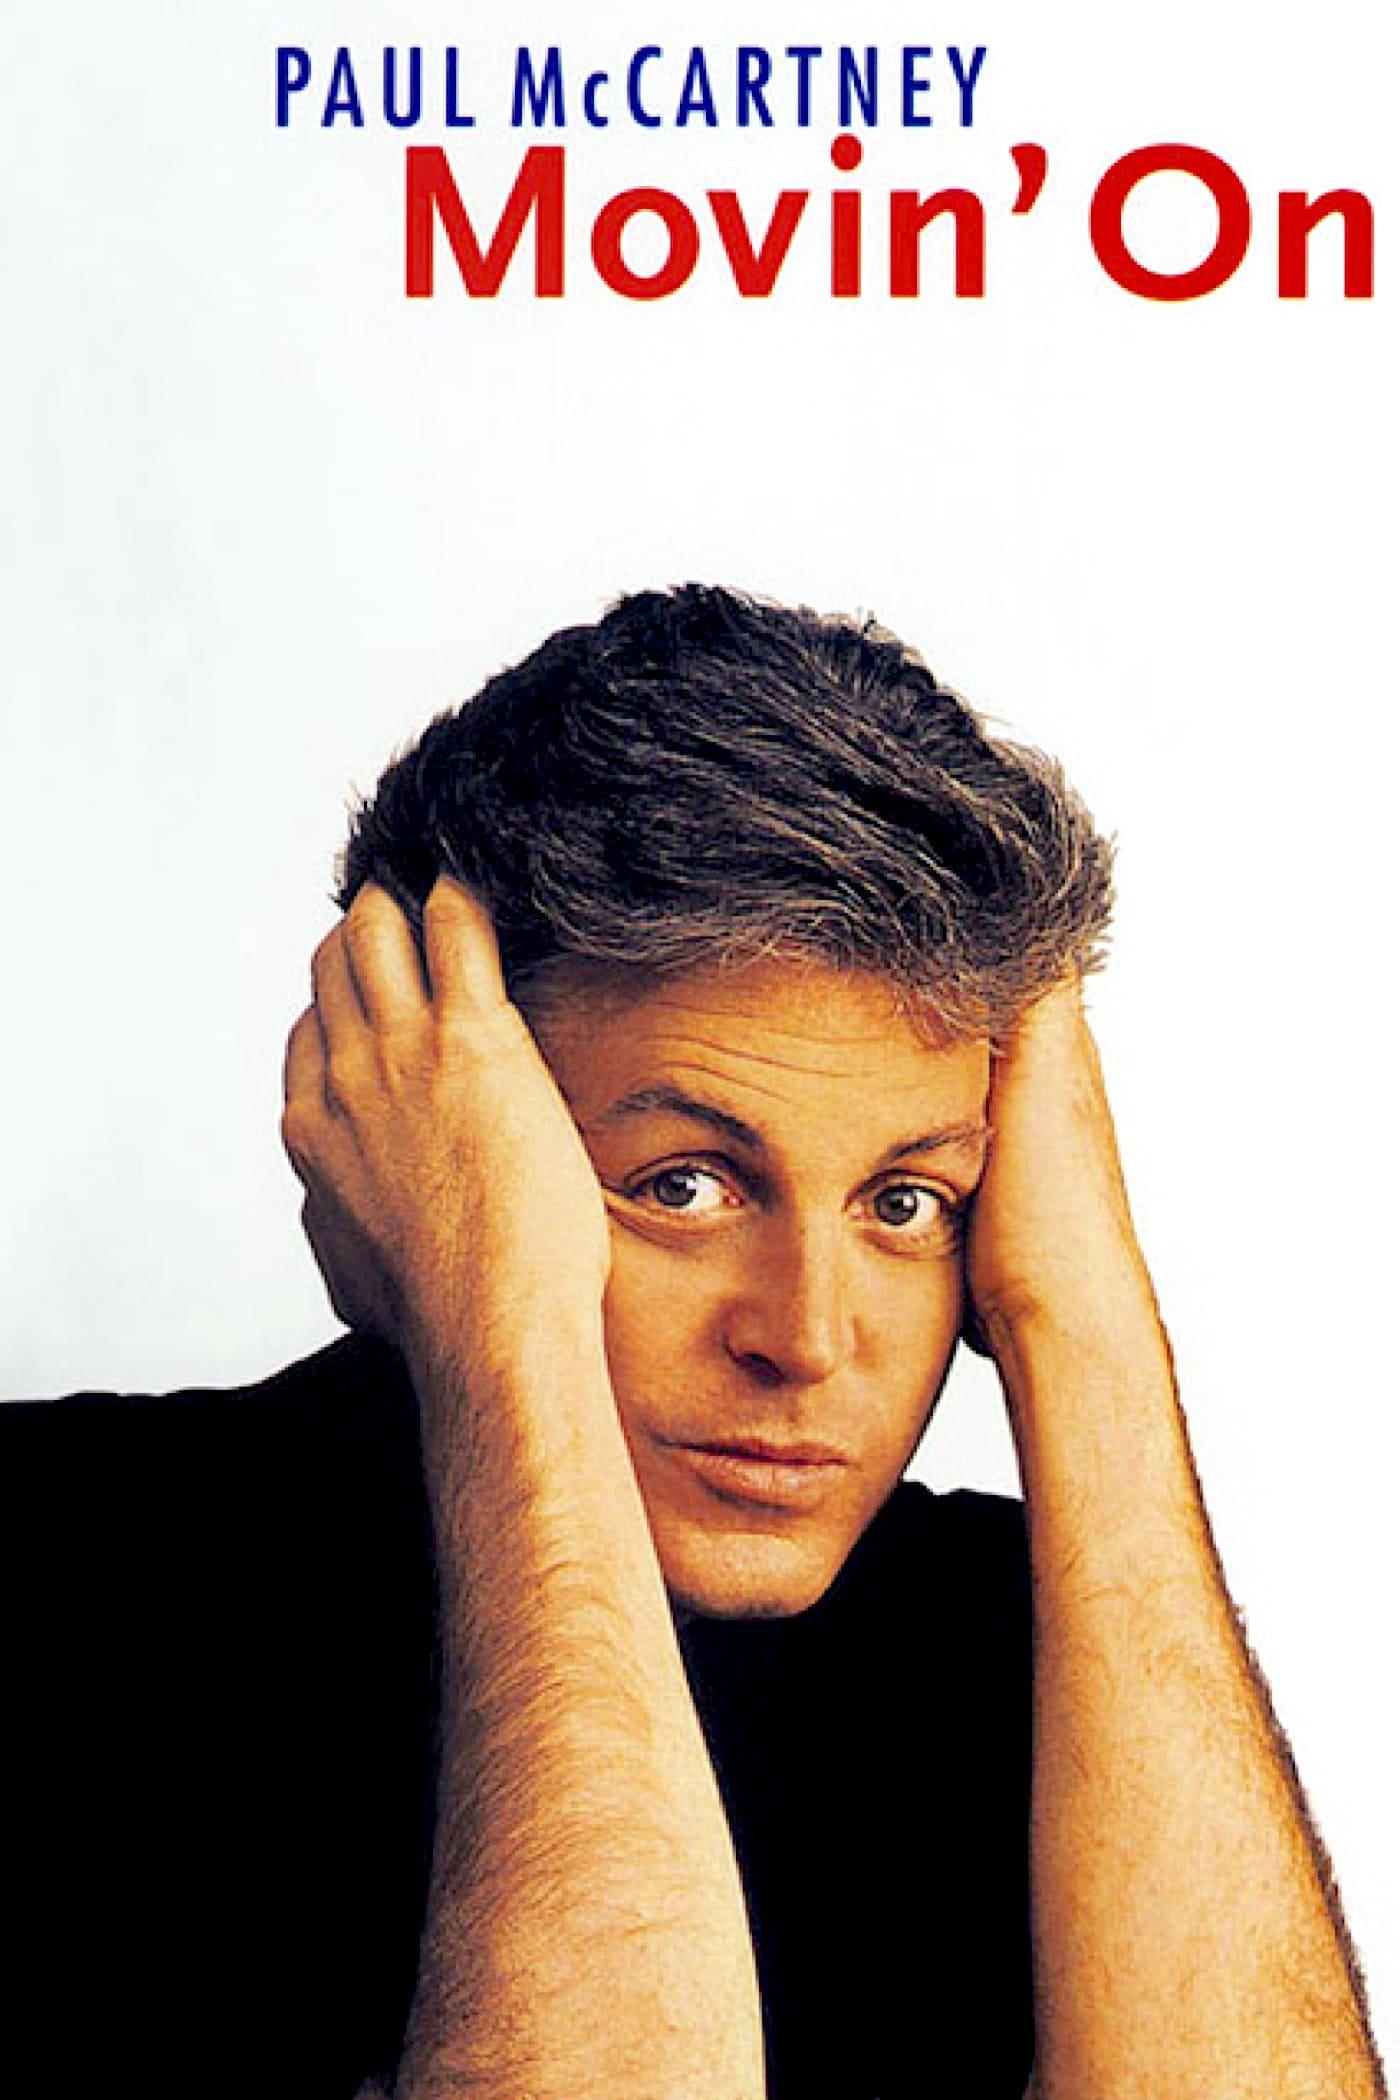 Paul McCartney: Movin' On